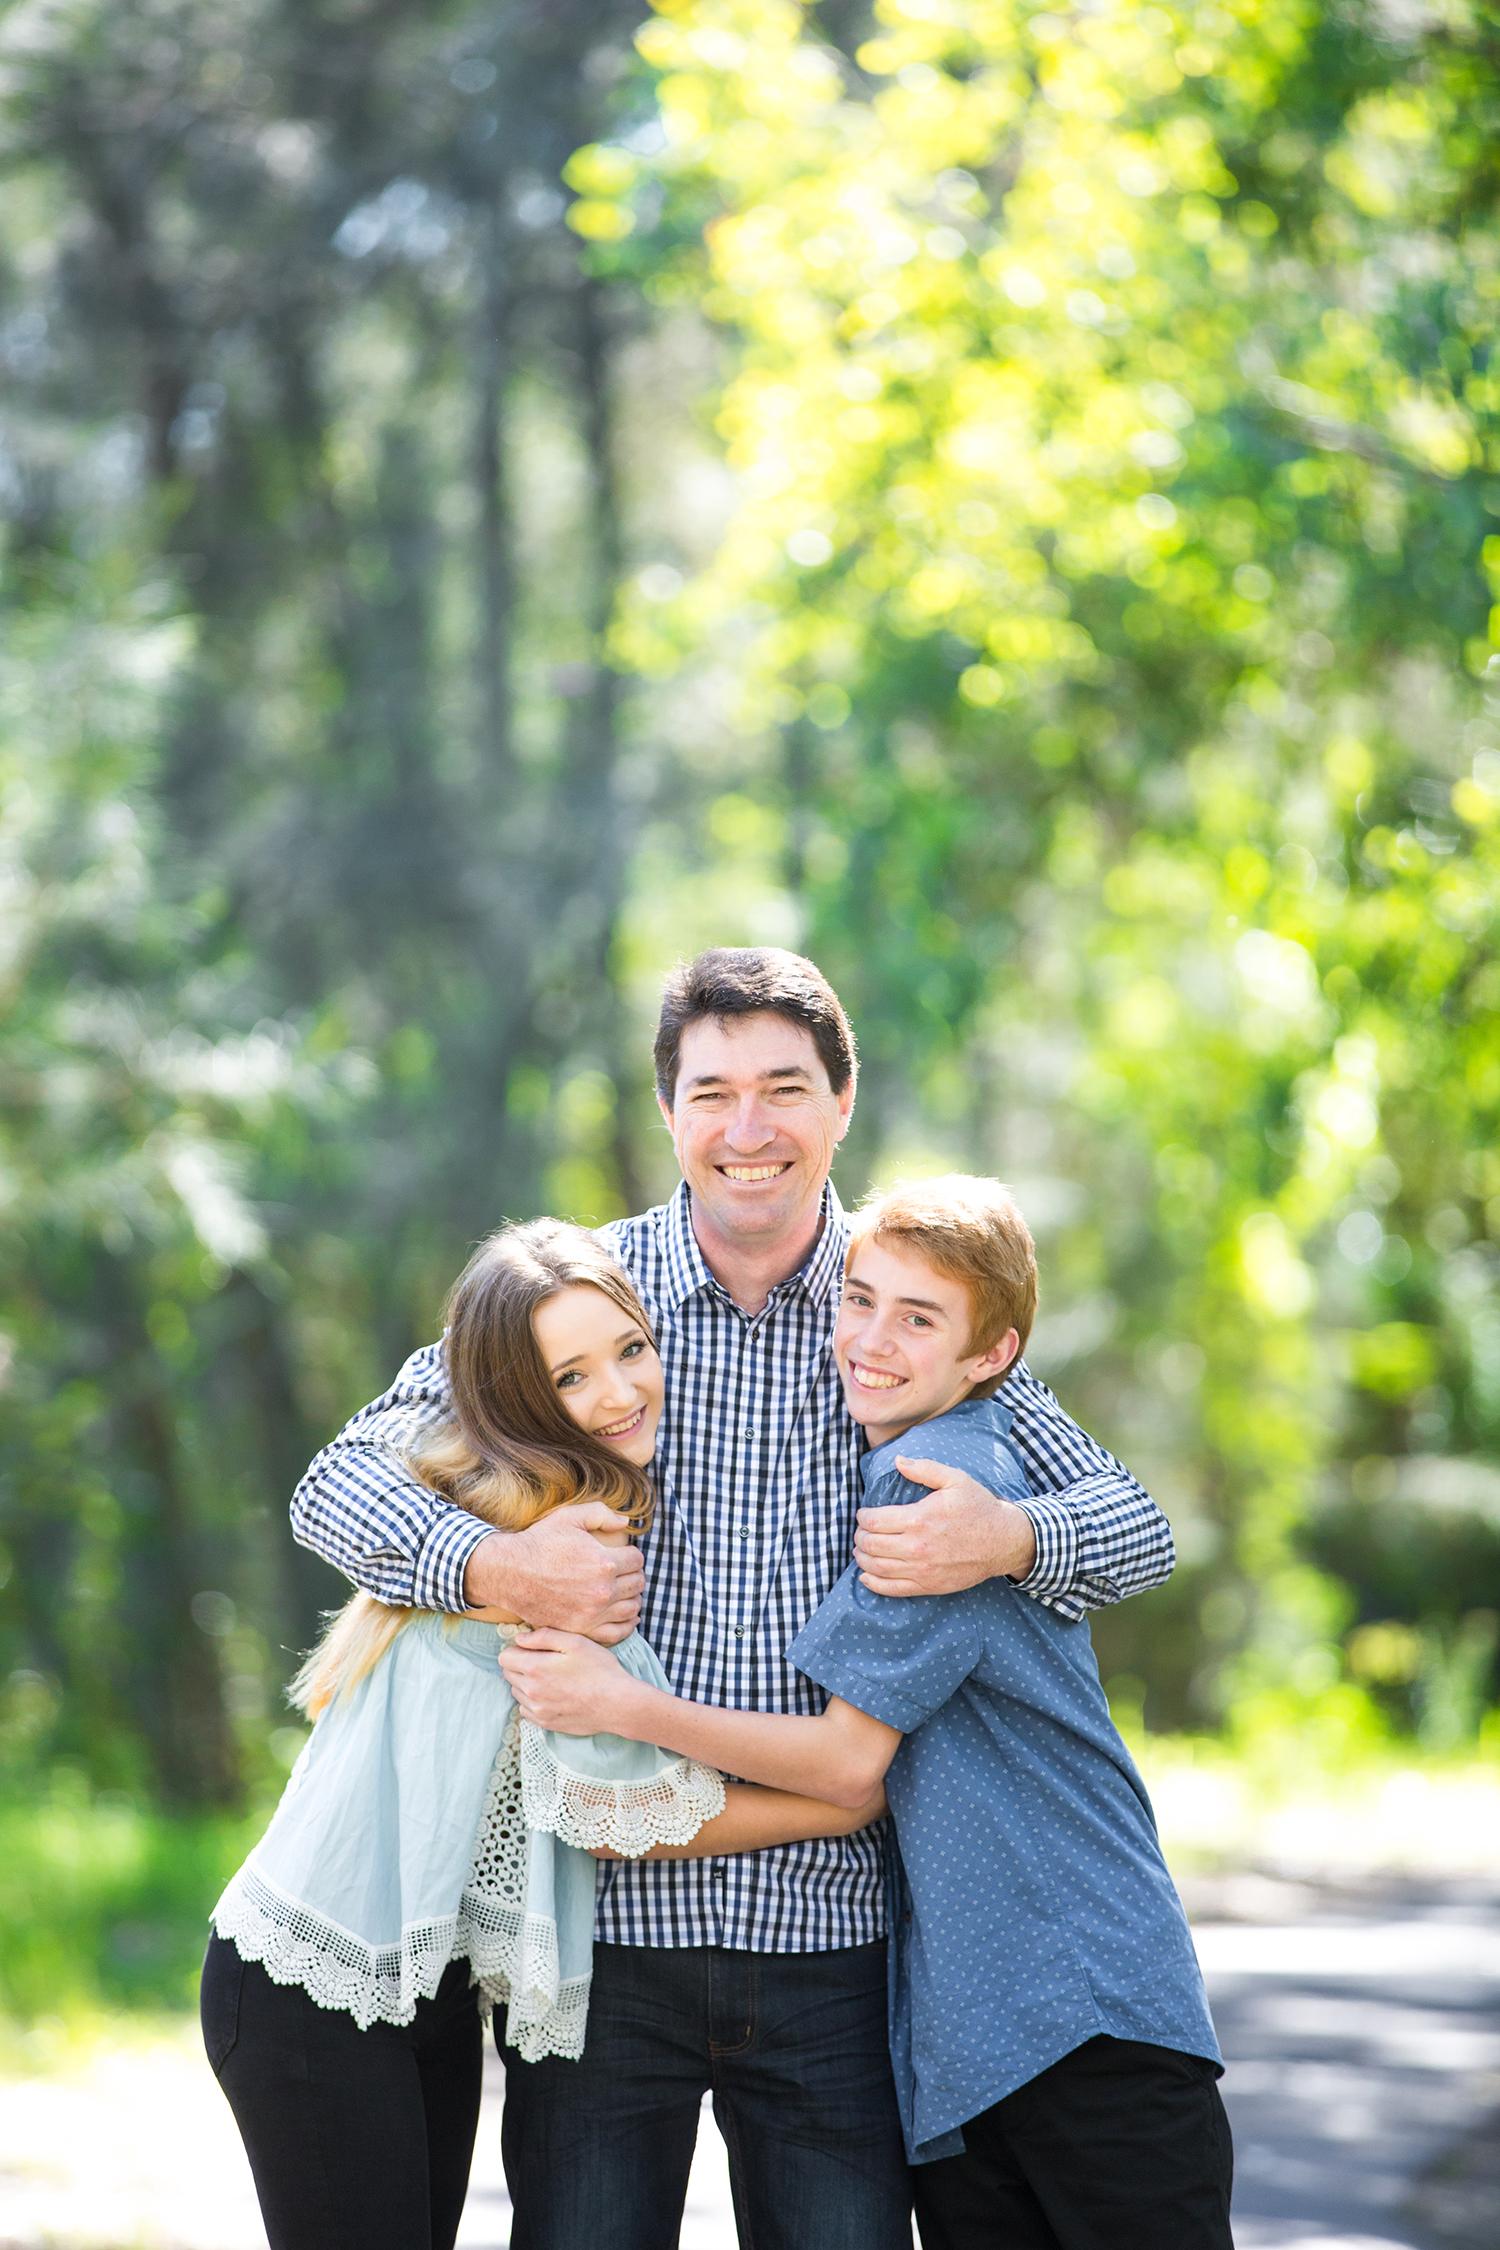 Sydney Family Photographer - Jennifer Lam Photography (24).jpg